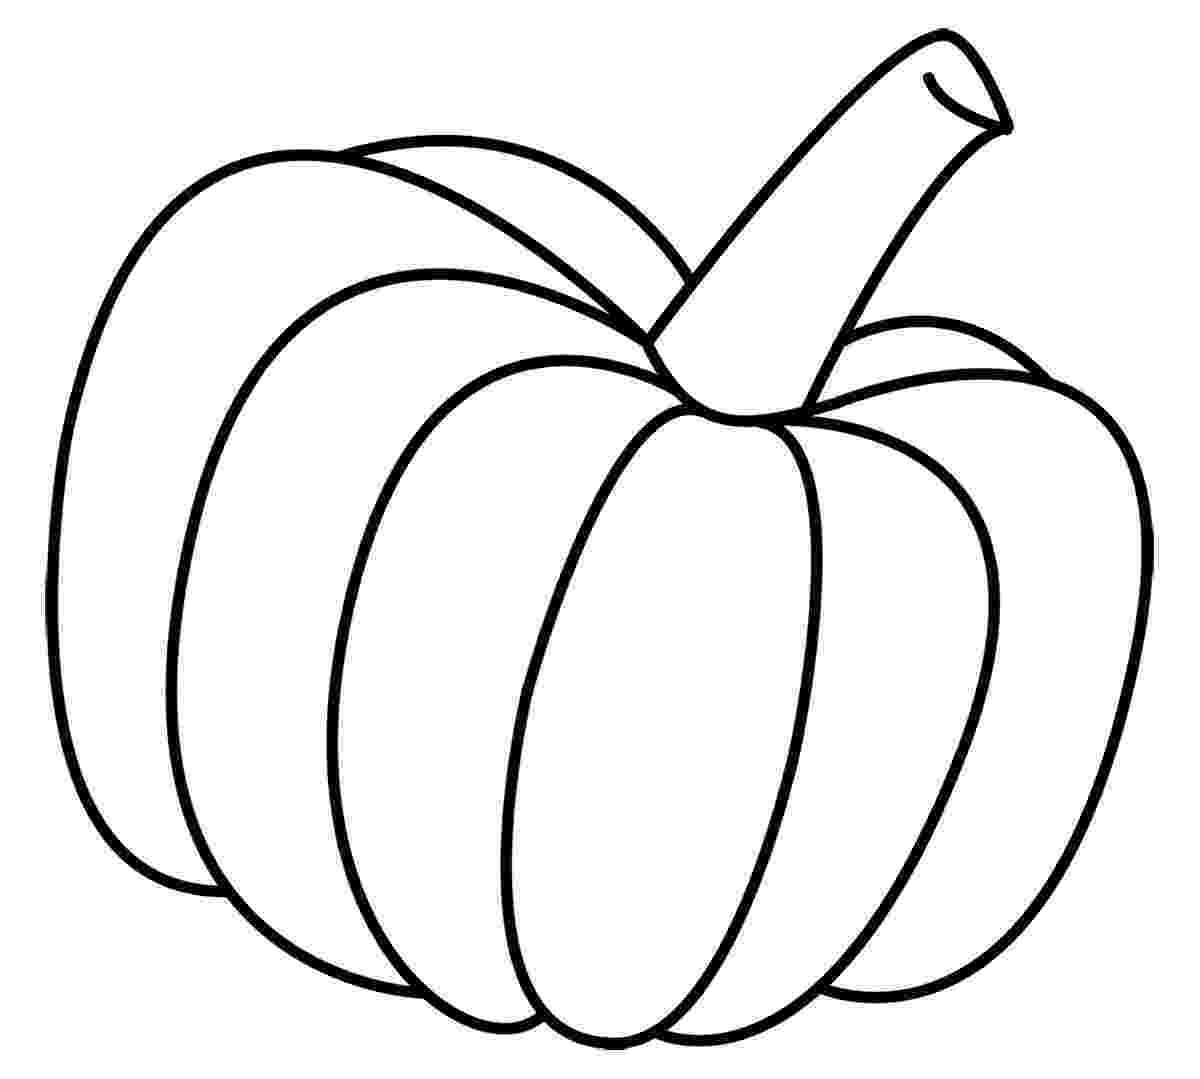 color a pumpkin free printable pumpkin coloring pages for kids color a pumpkin 1 2